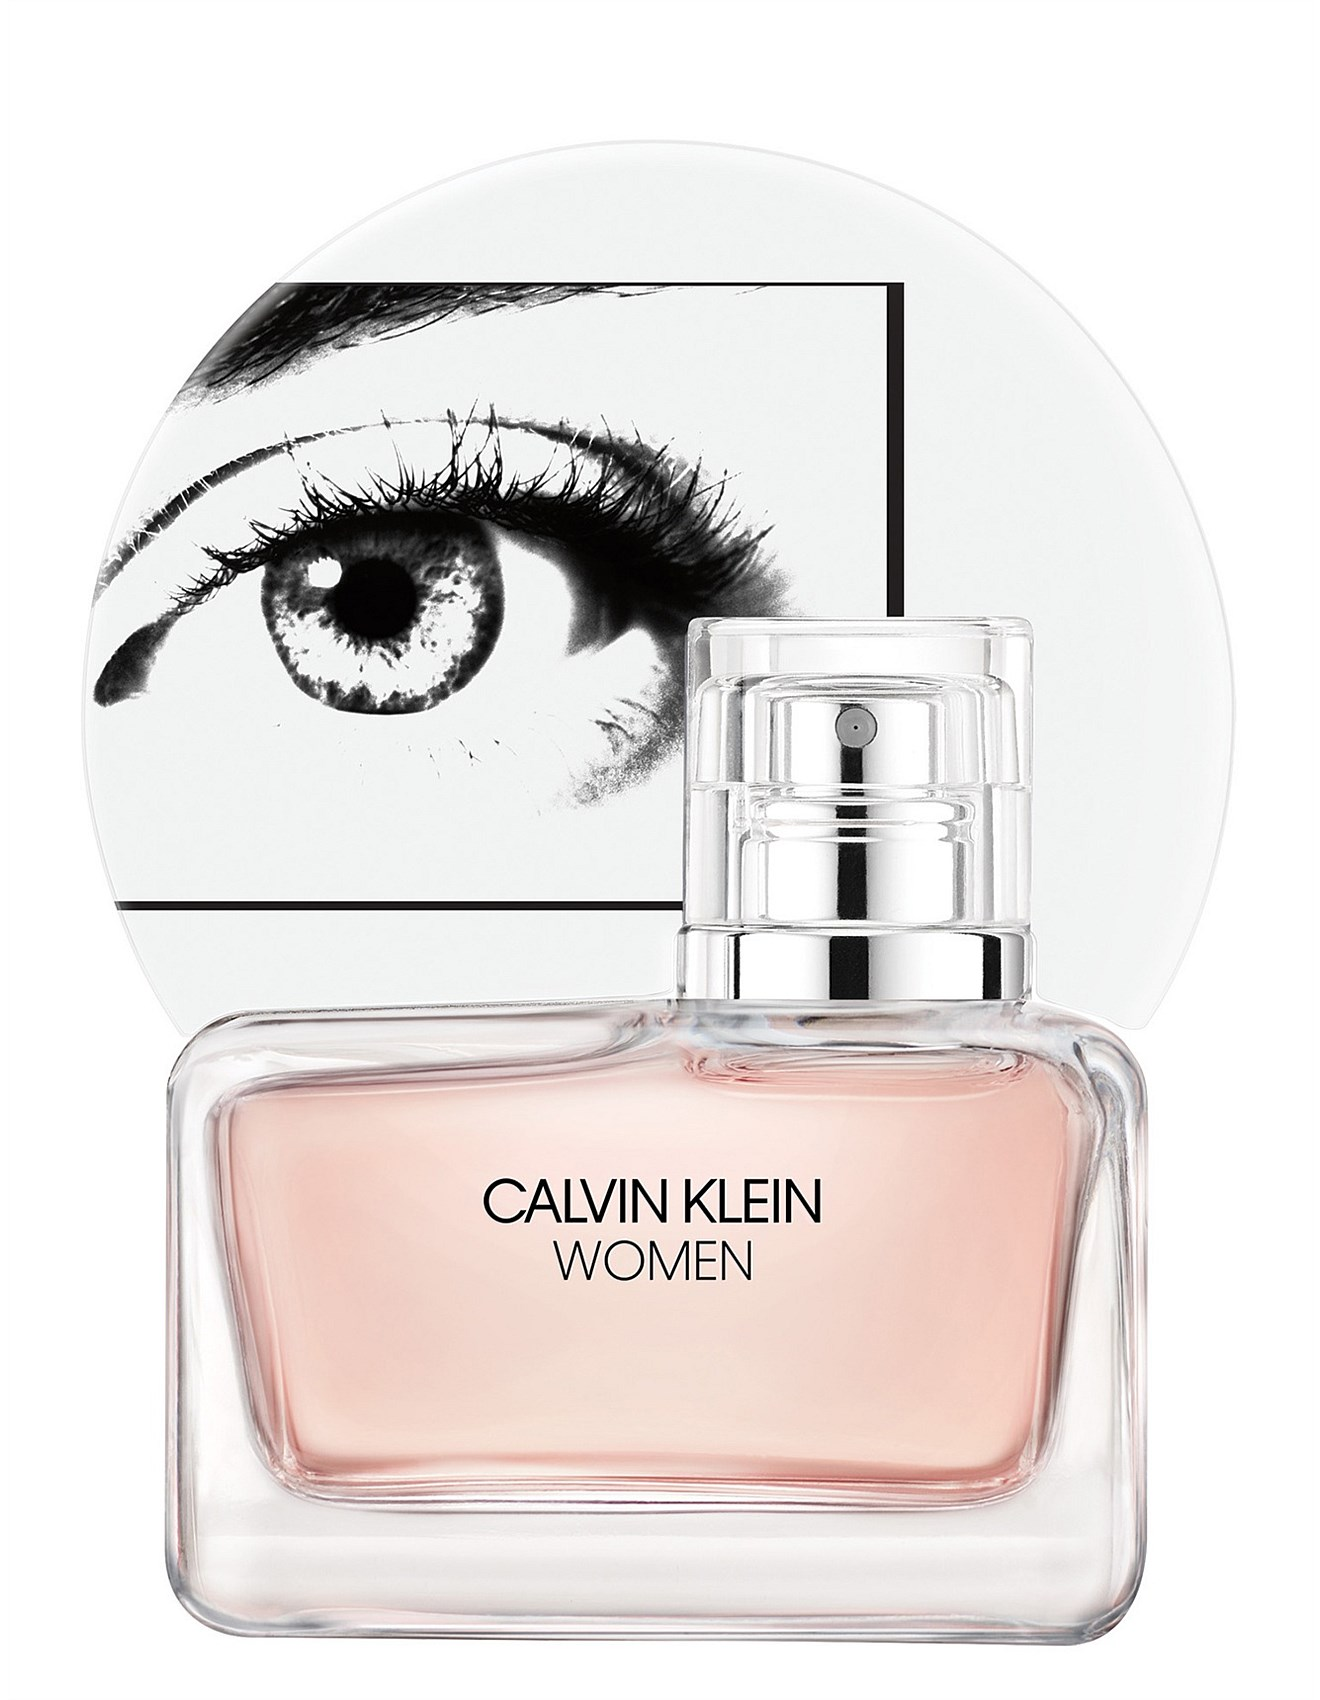 Womens Perfume Calvin Klein Women Eau De Parfum 50ml